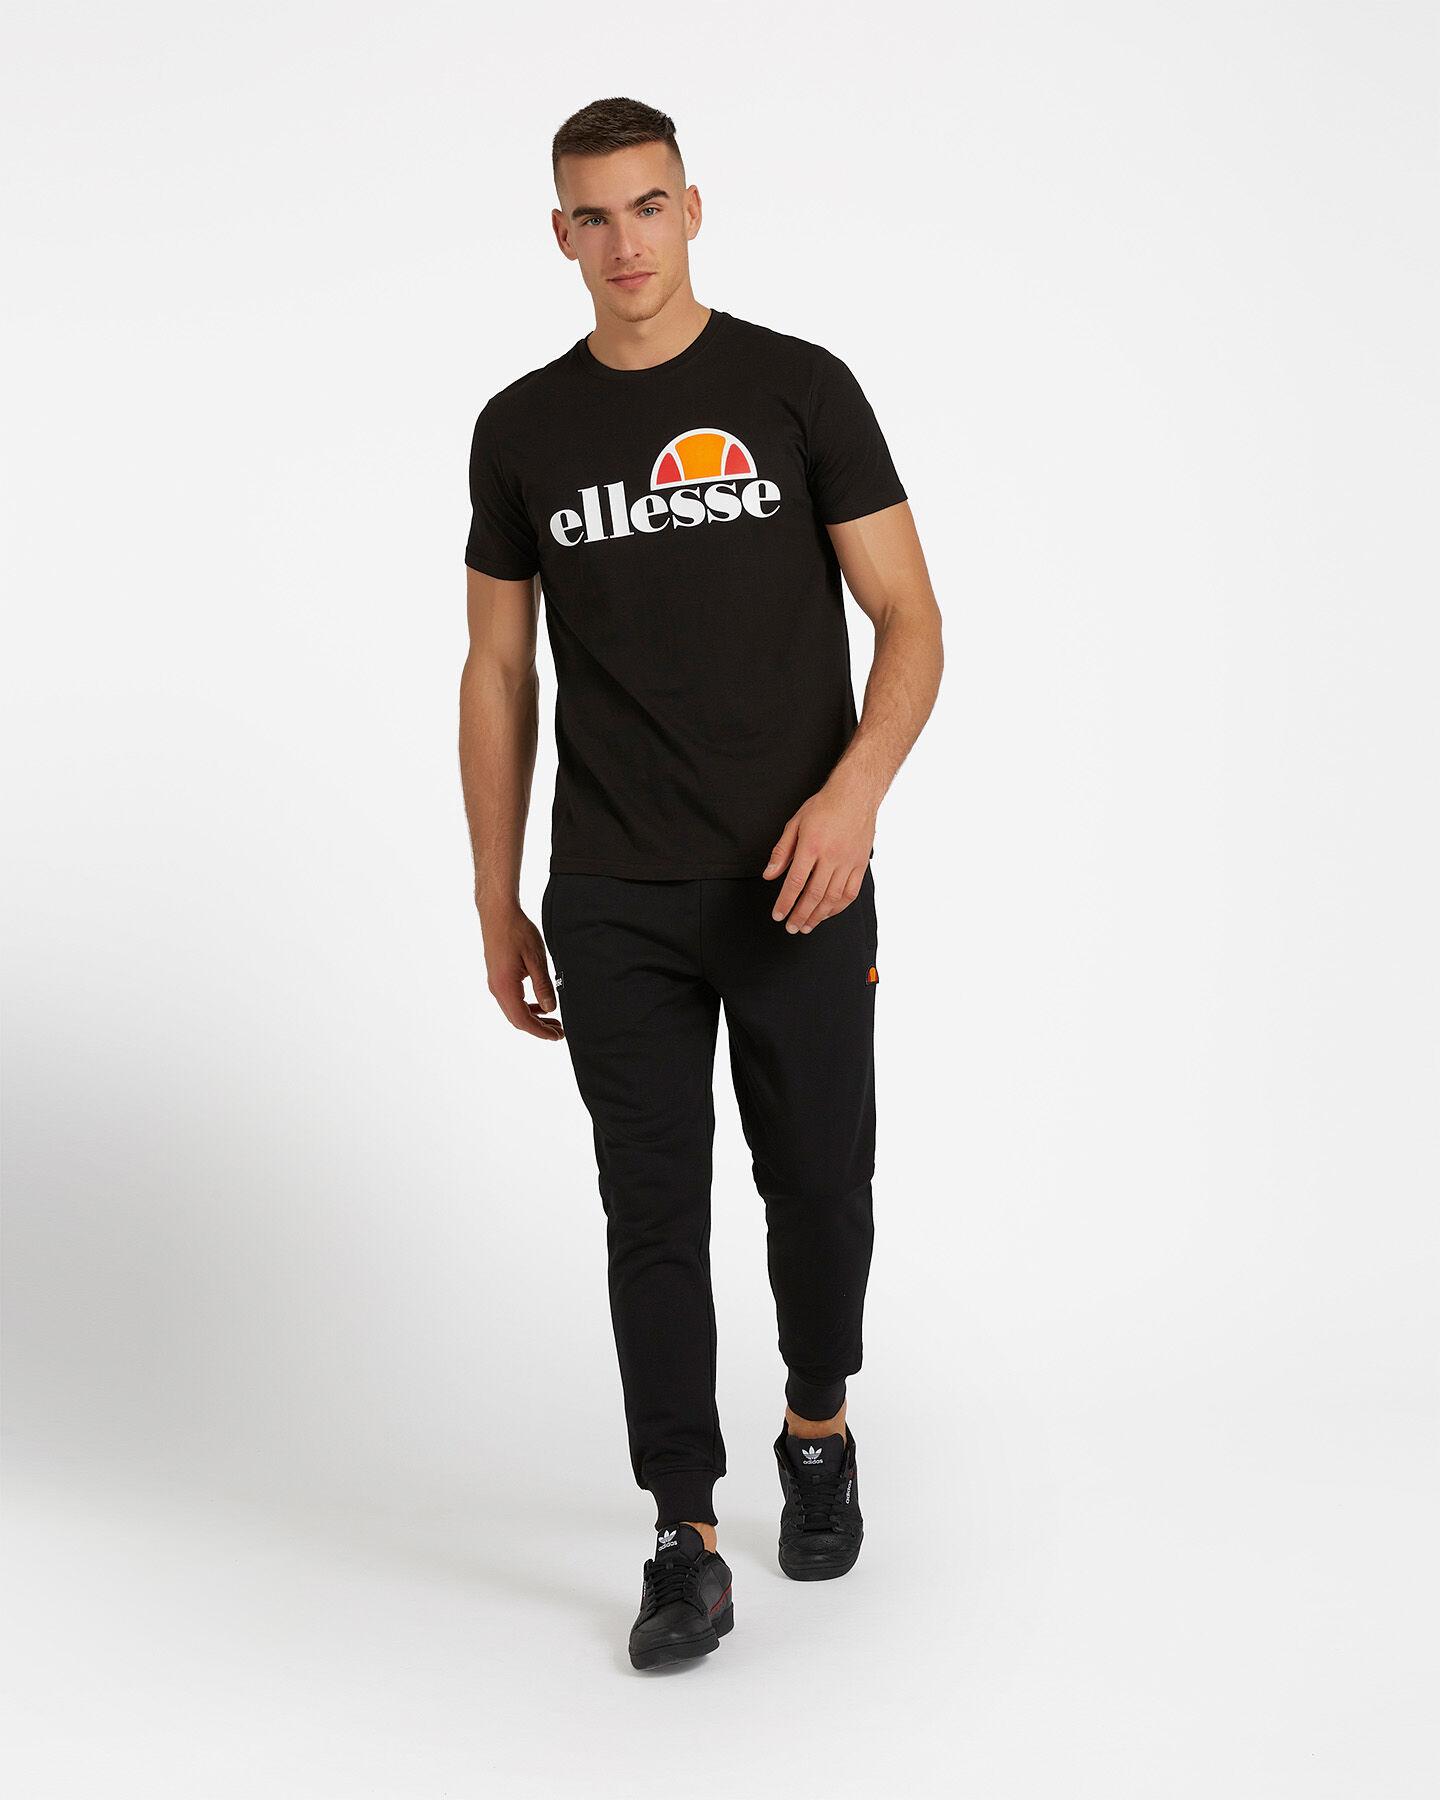 T-Shirt ELLESSE BIG LOGO M S4073846 scatto 3